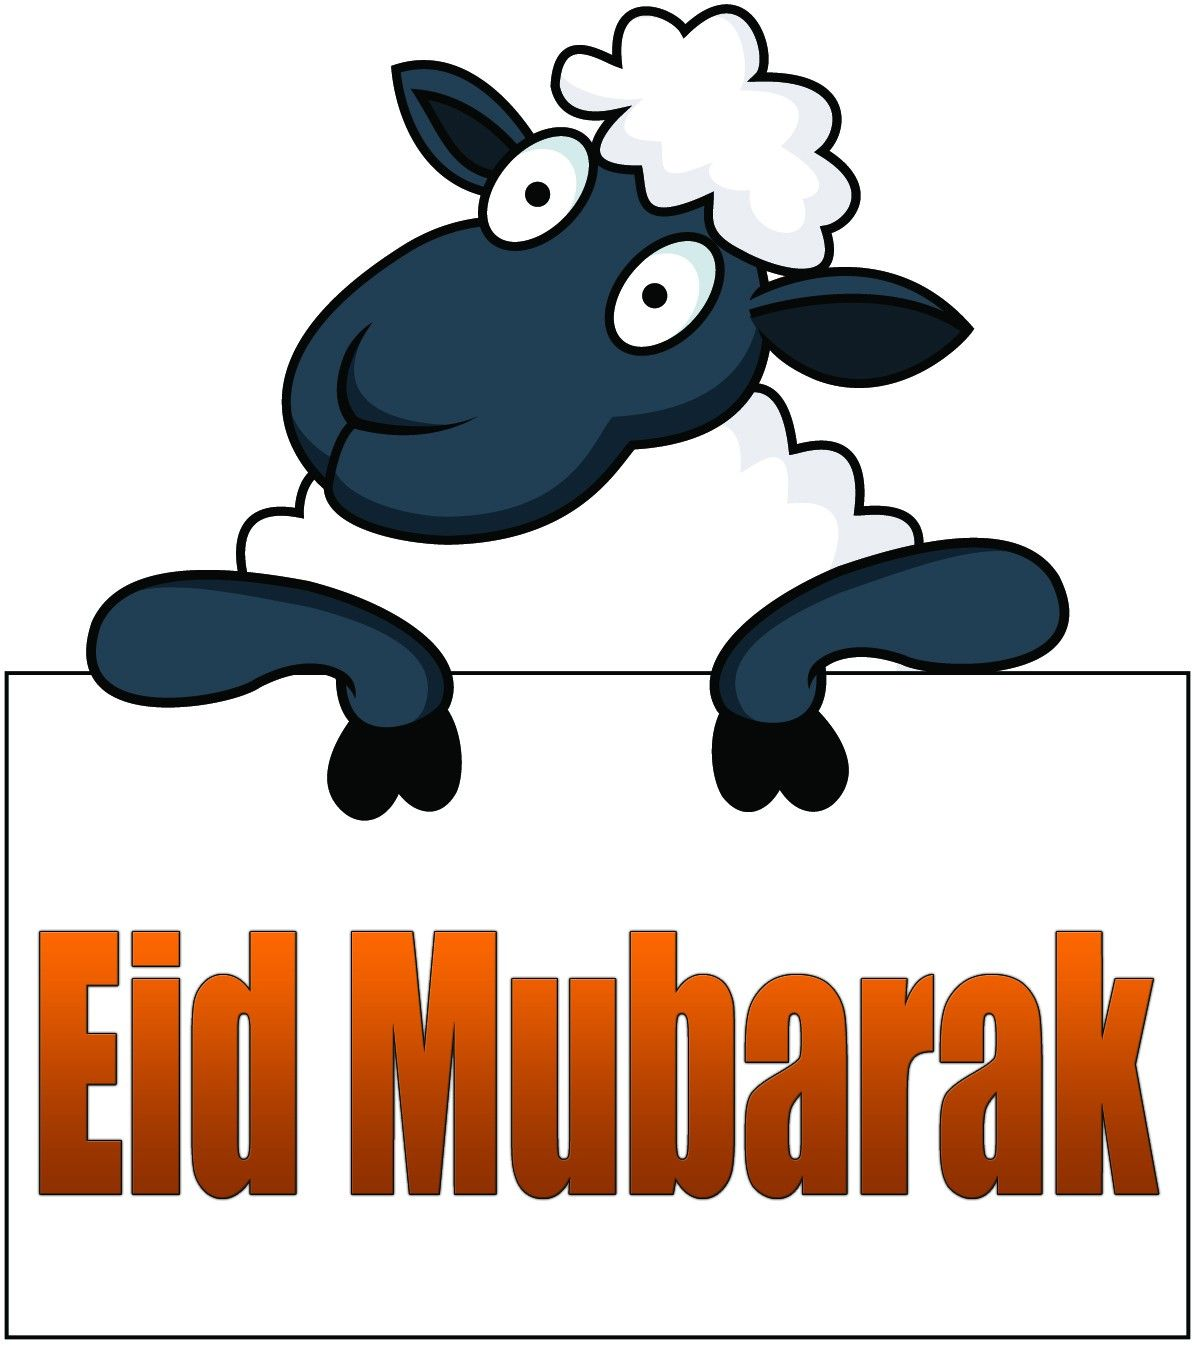 Funny Eid Ul Adha Sheep In Cartoon Pictures Elsoar Sheep Cartoon Eid Ul Adha Cartoon Pics